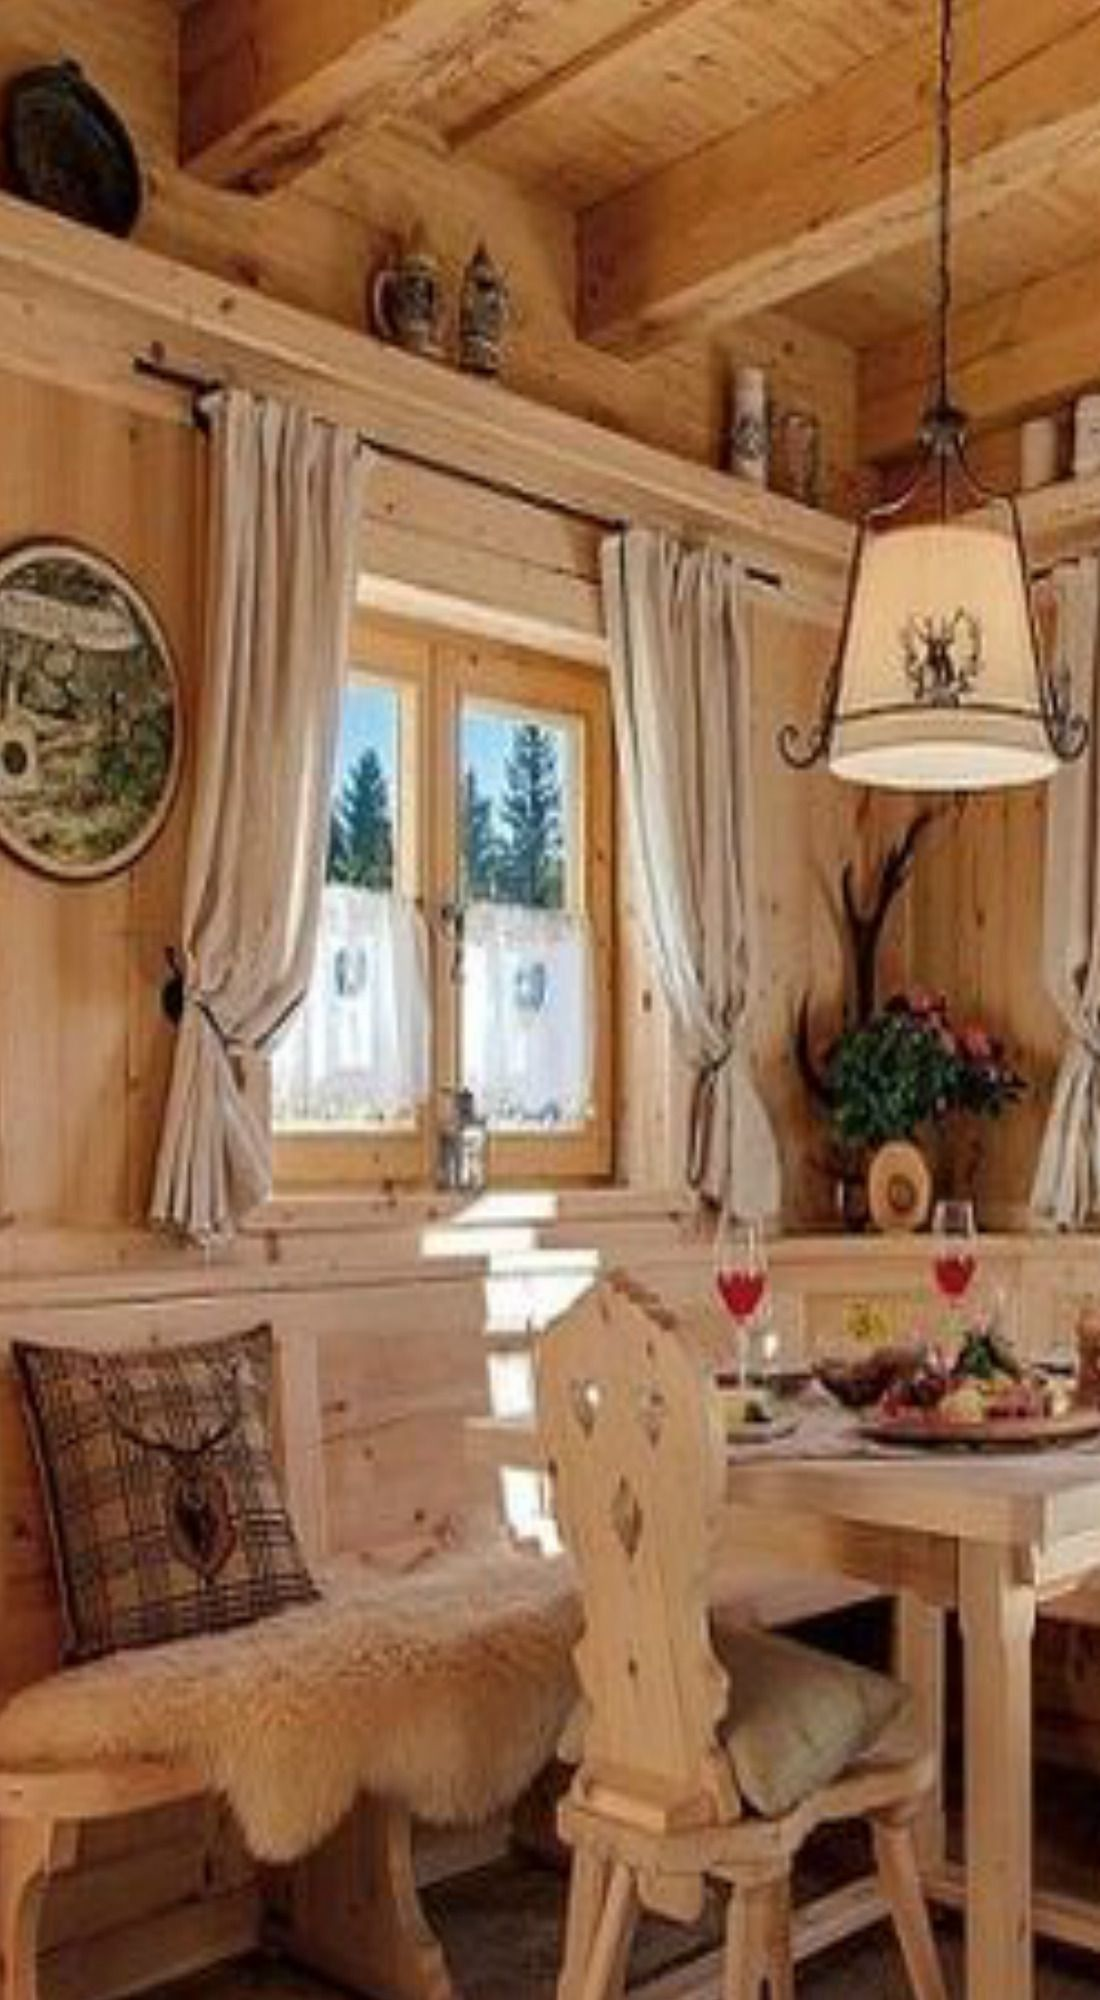 Arte Del Rustico Aosta pin di ♡ely♡ su ♡das romanticsche hotel helga